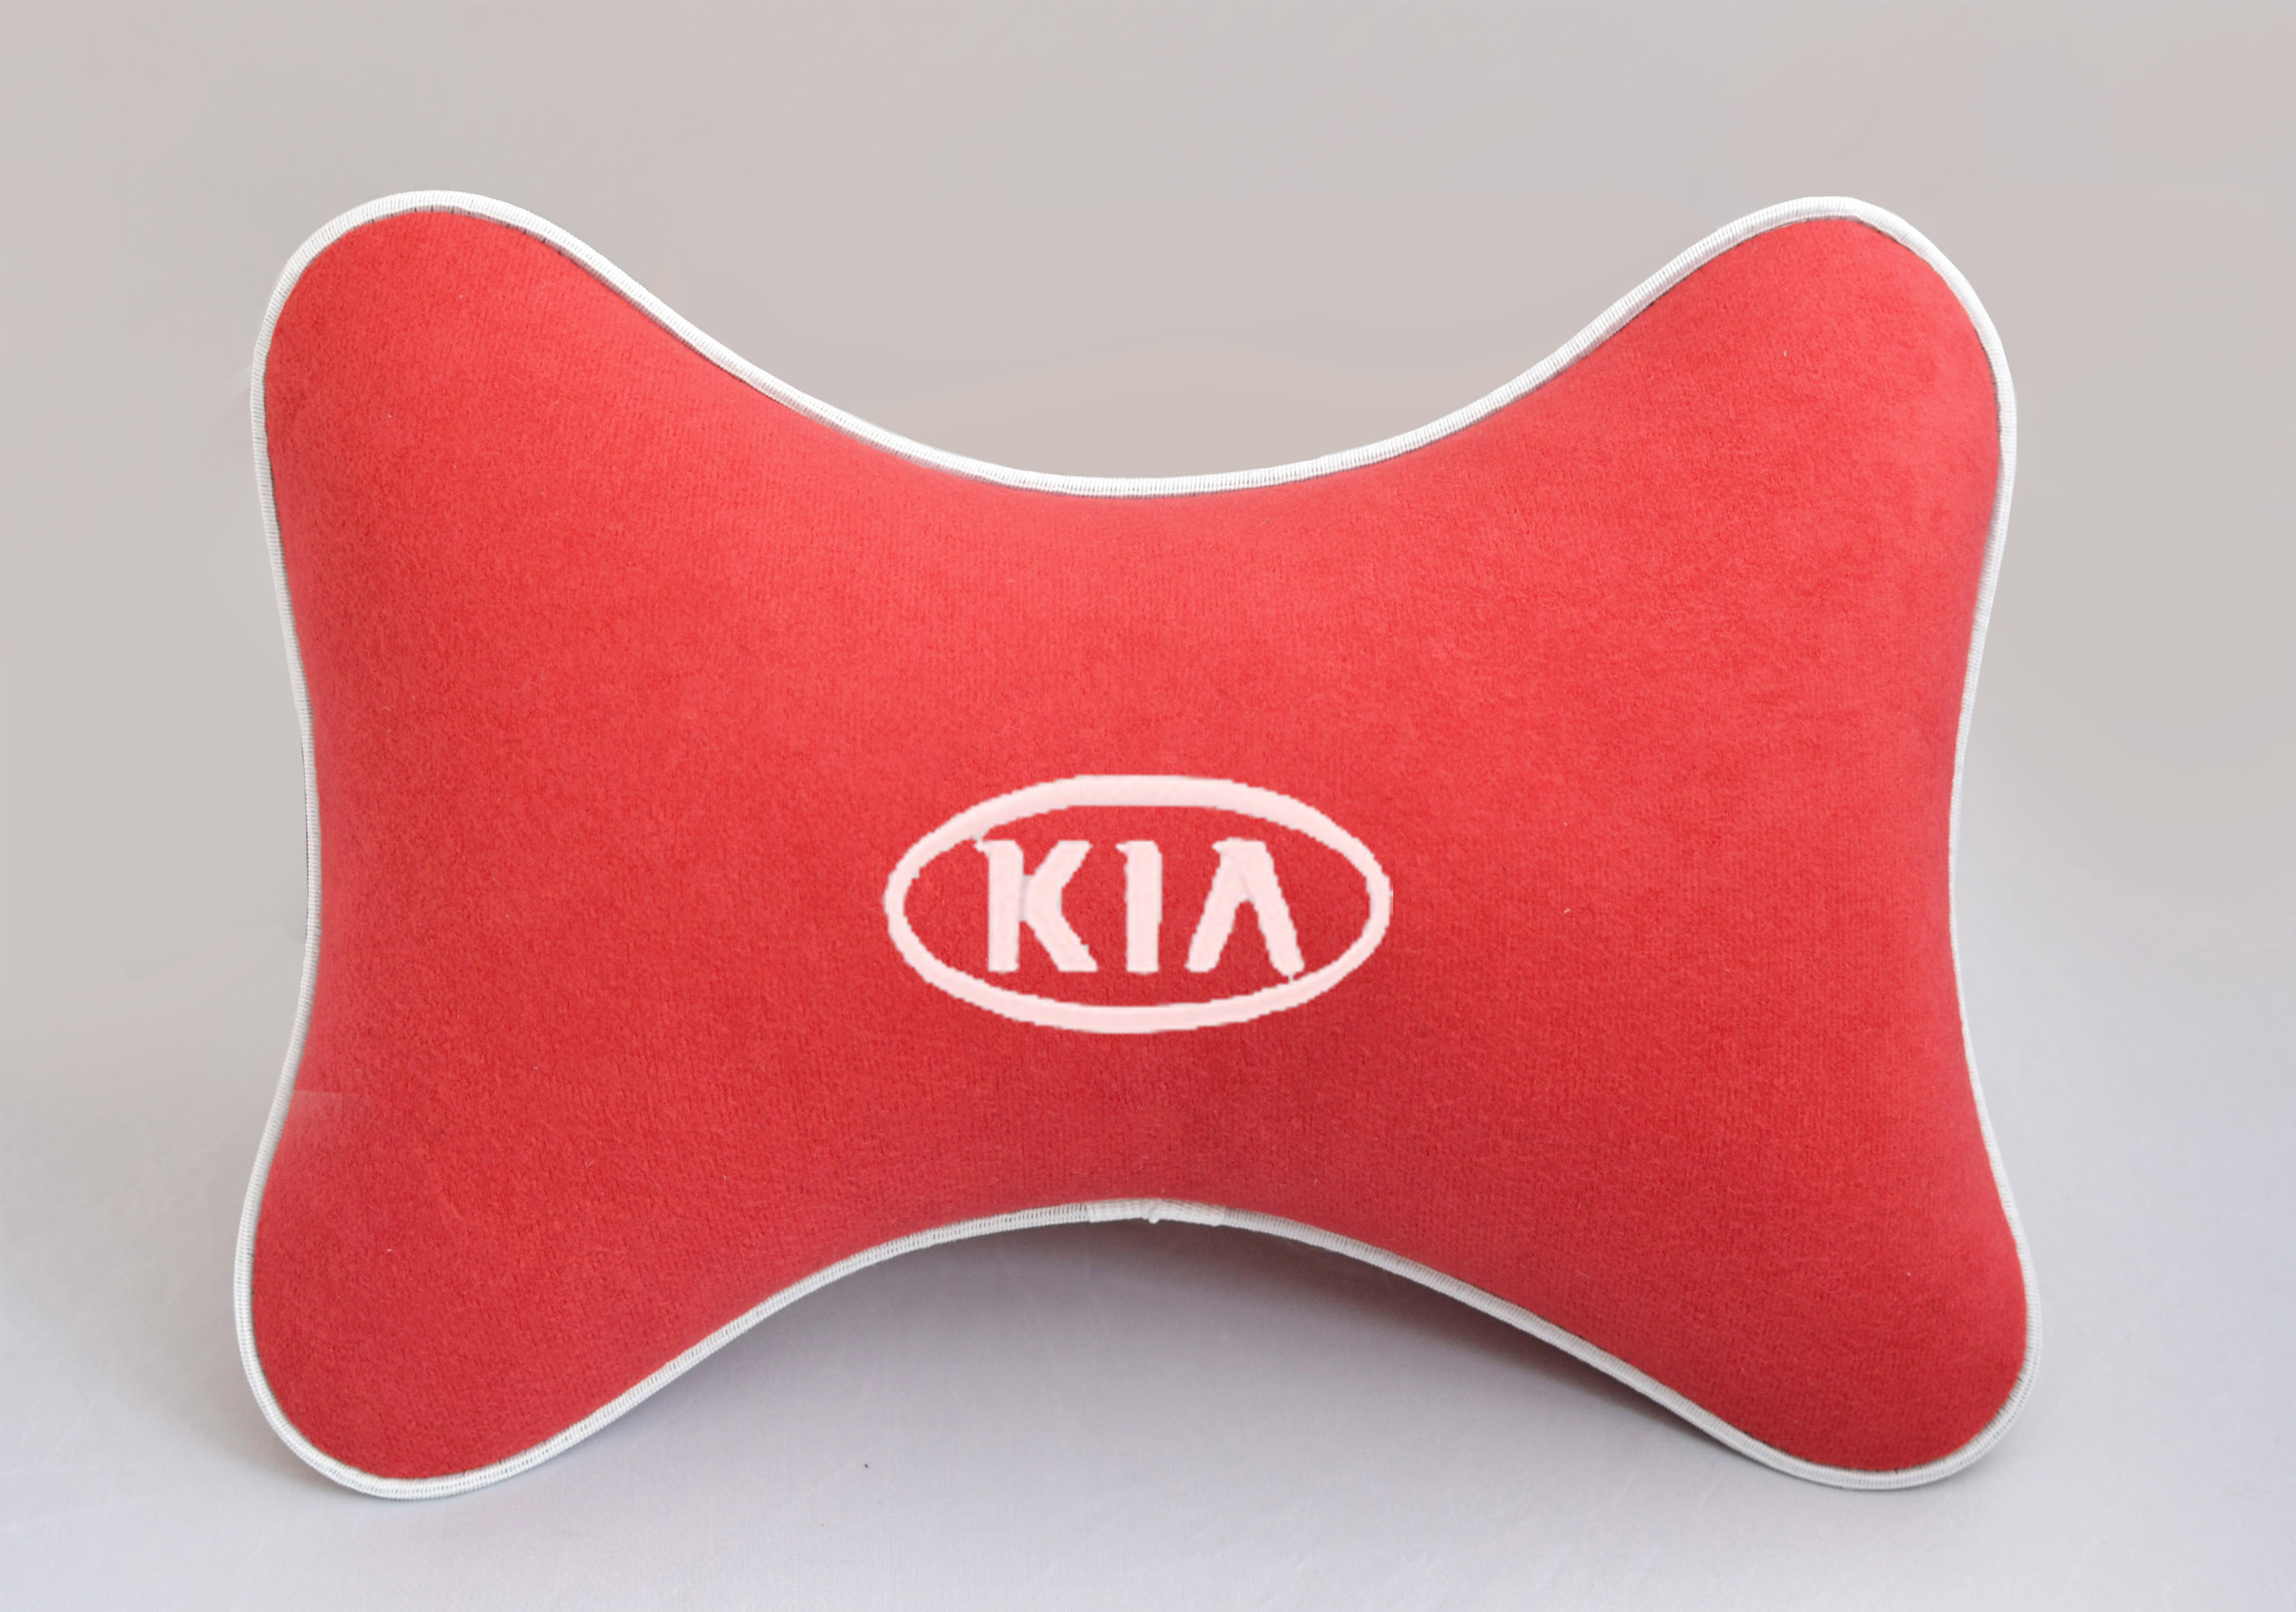 Подушка на подголовник из красного велюра KIA